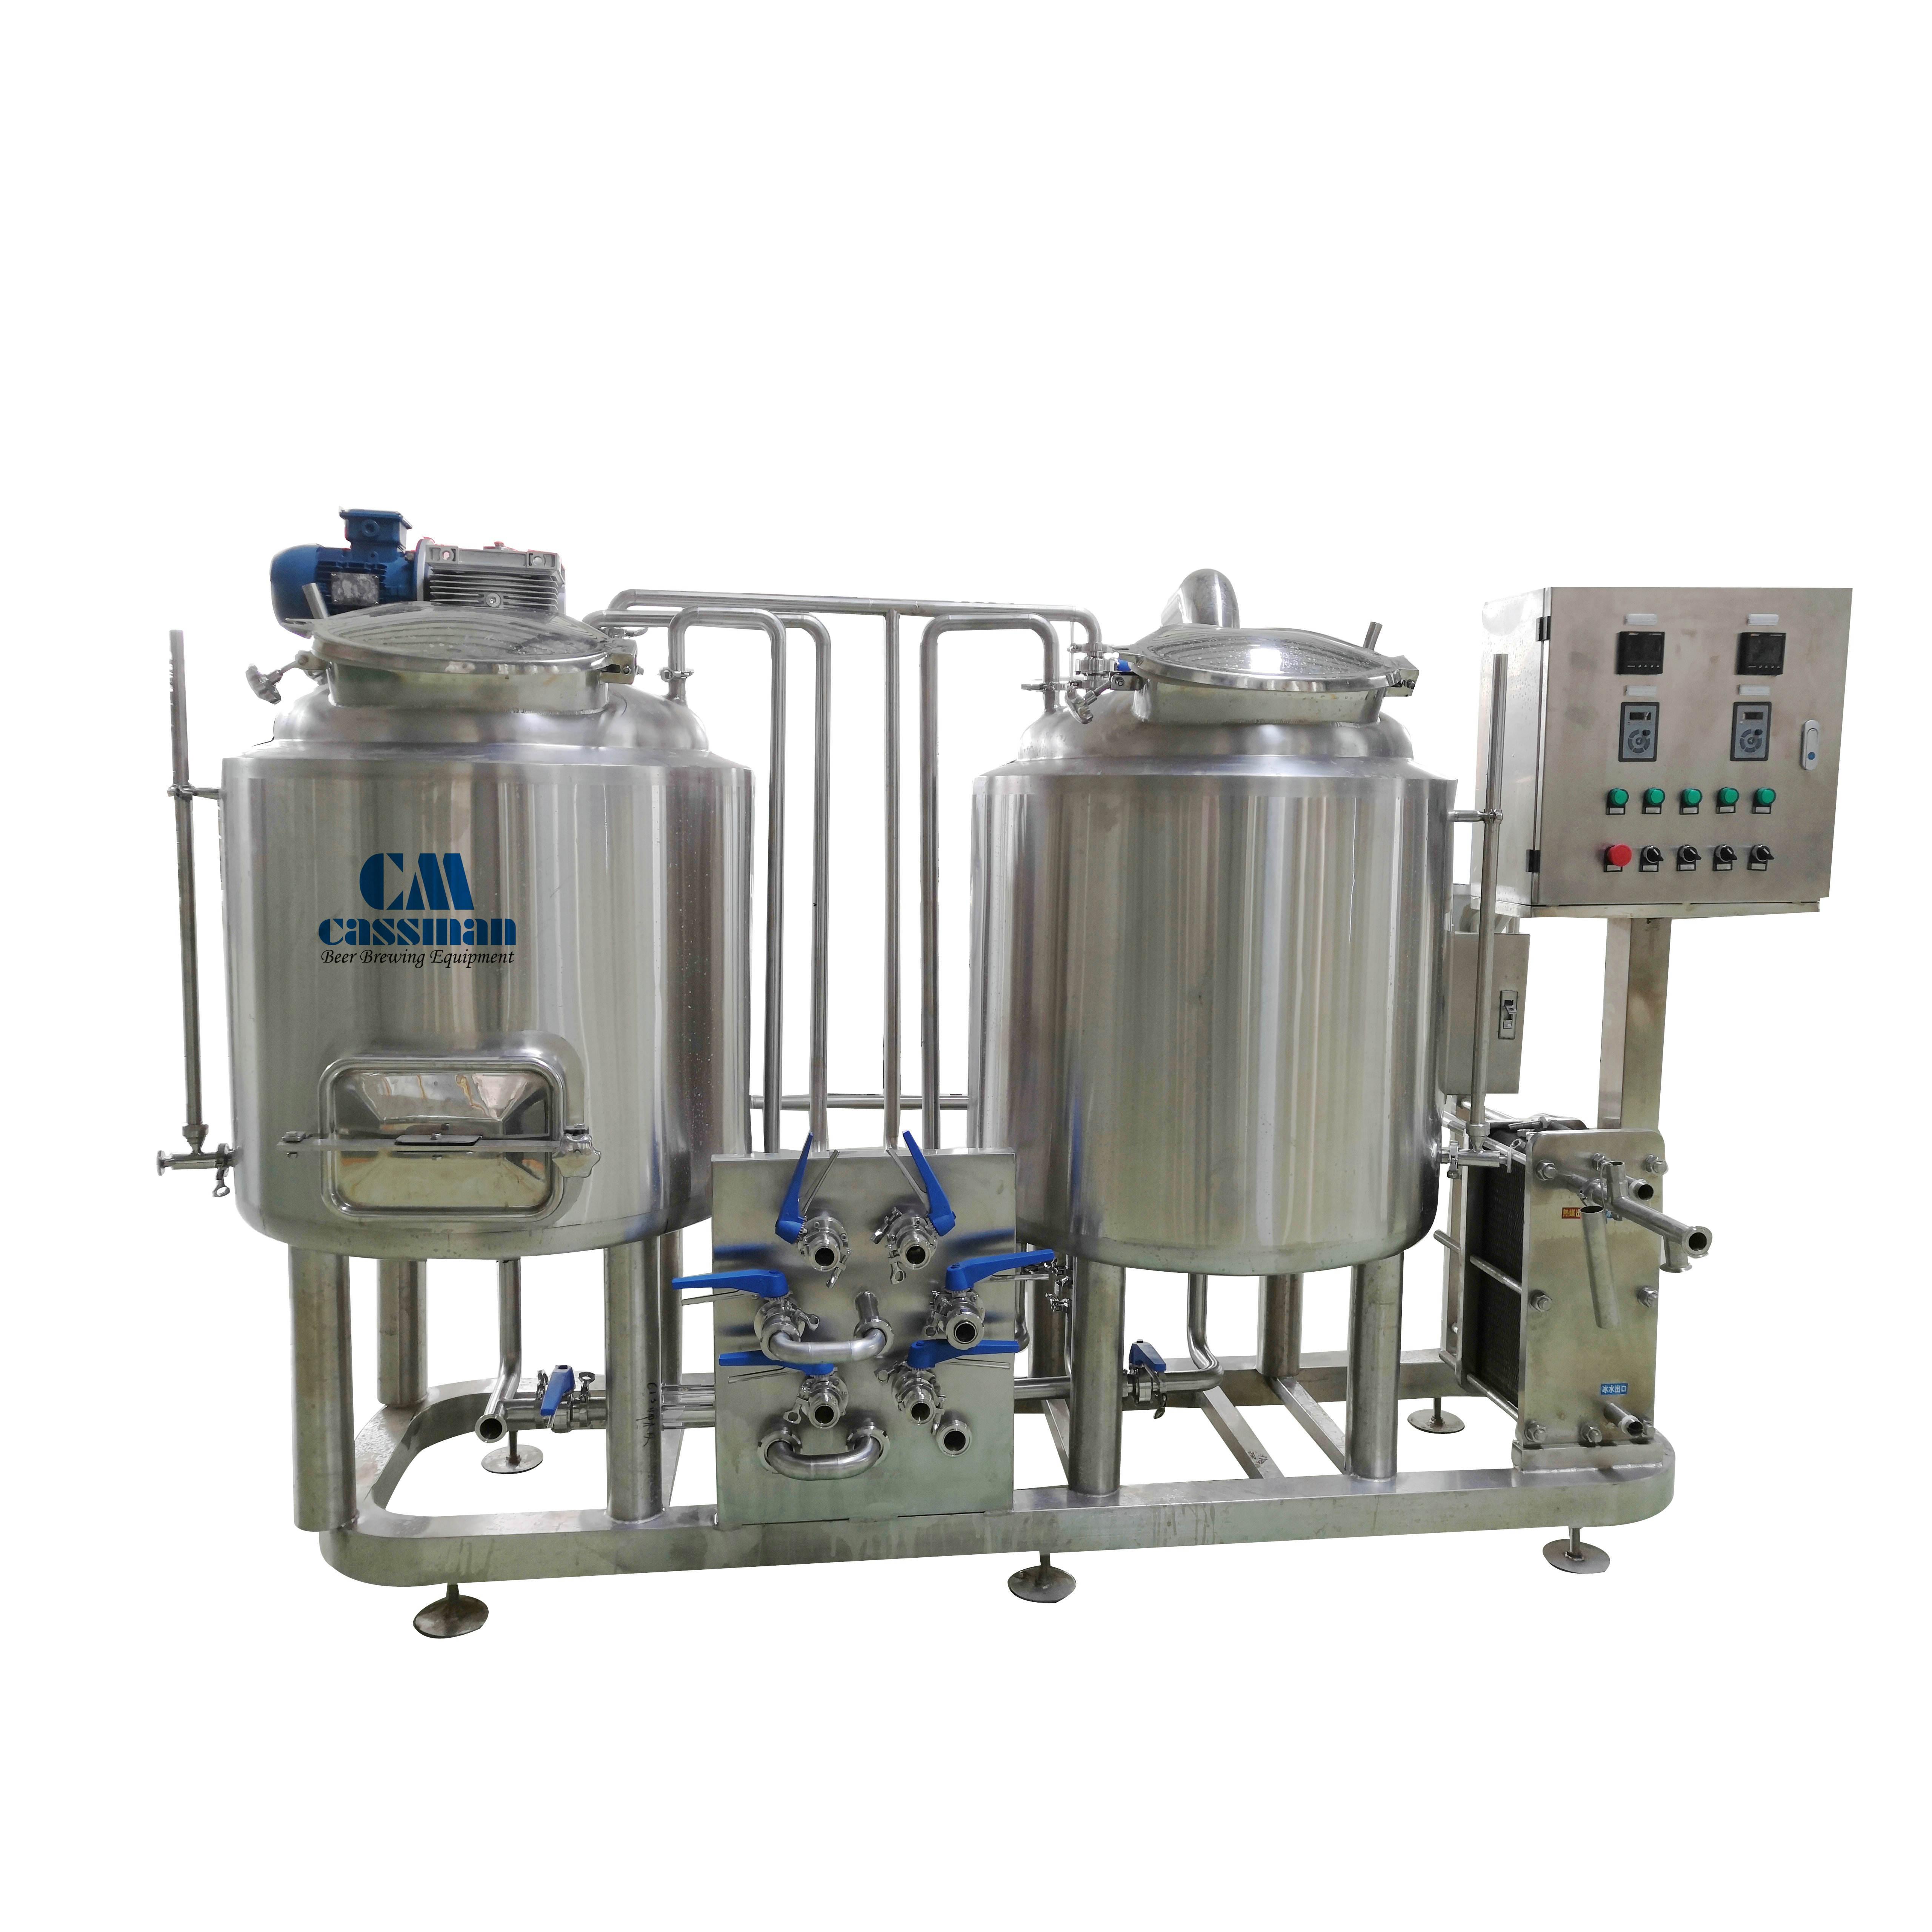 Организация мини-завода по производству спирта